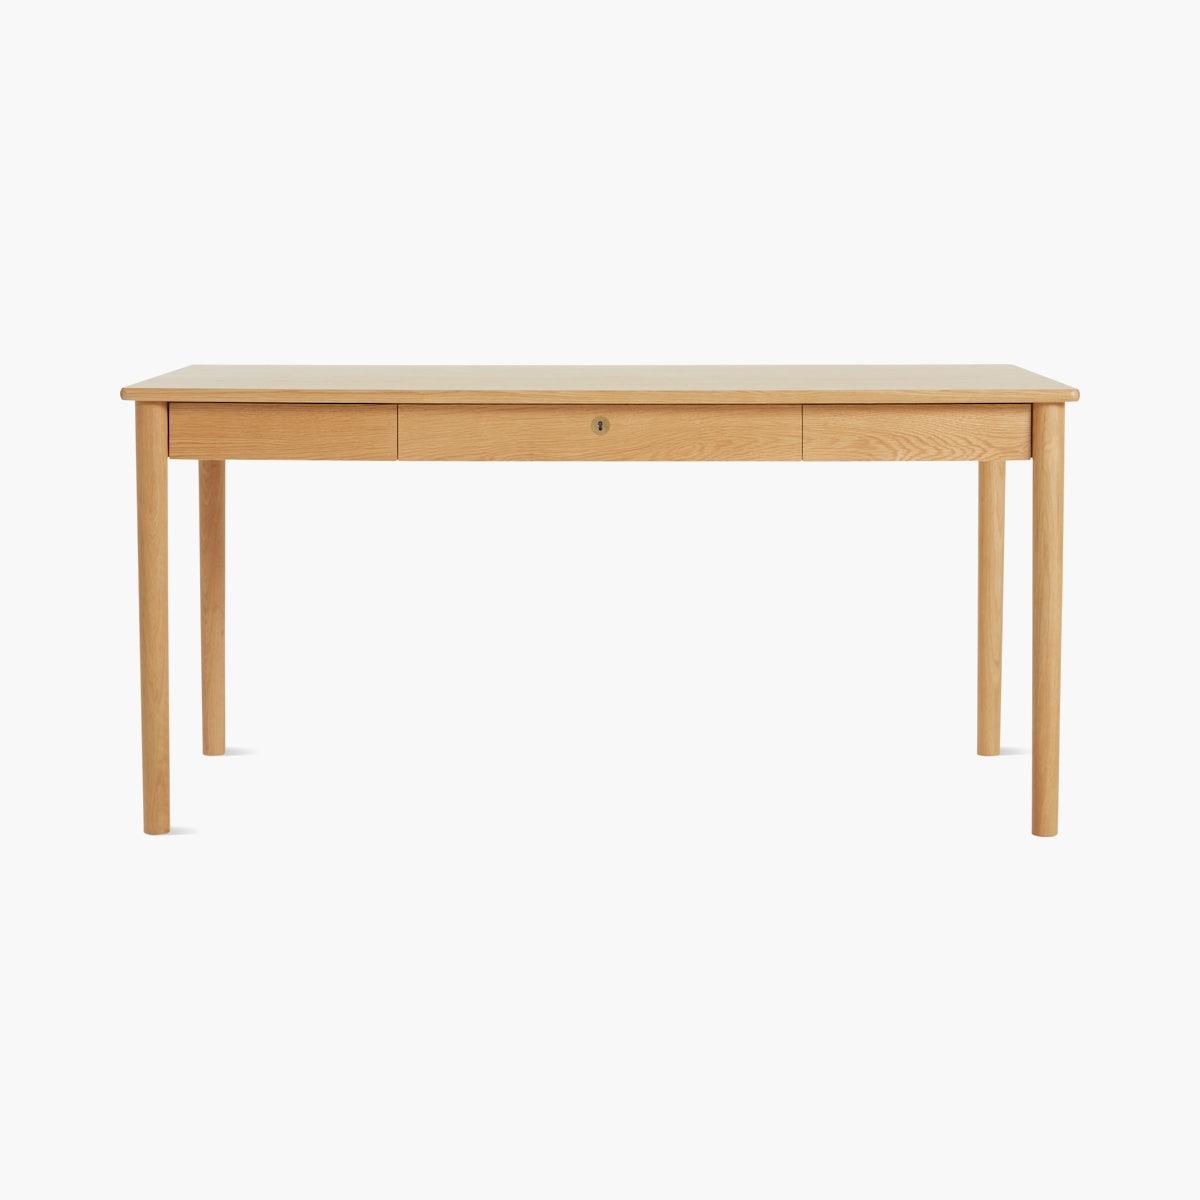 Edel Table, Standard